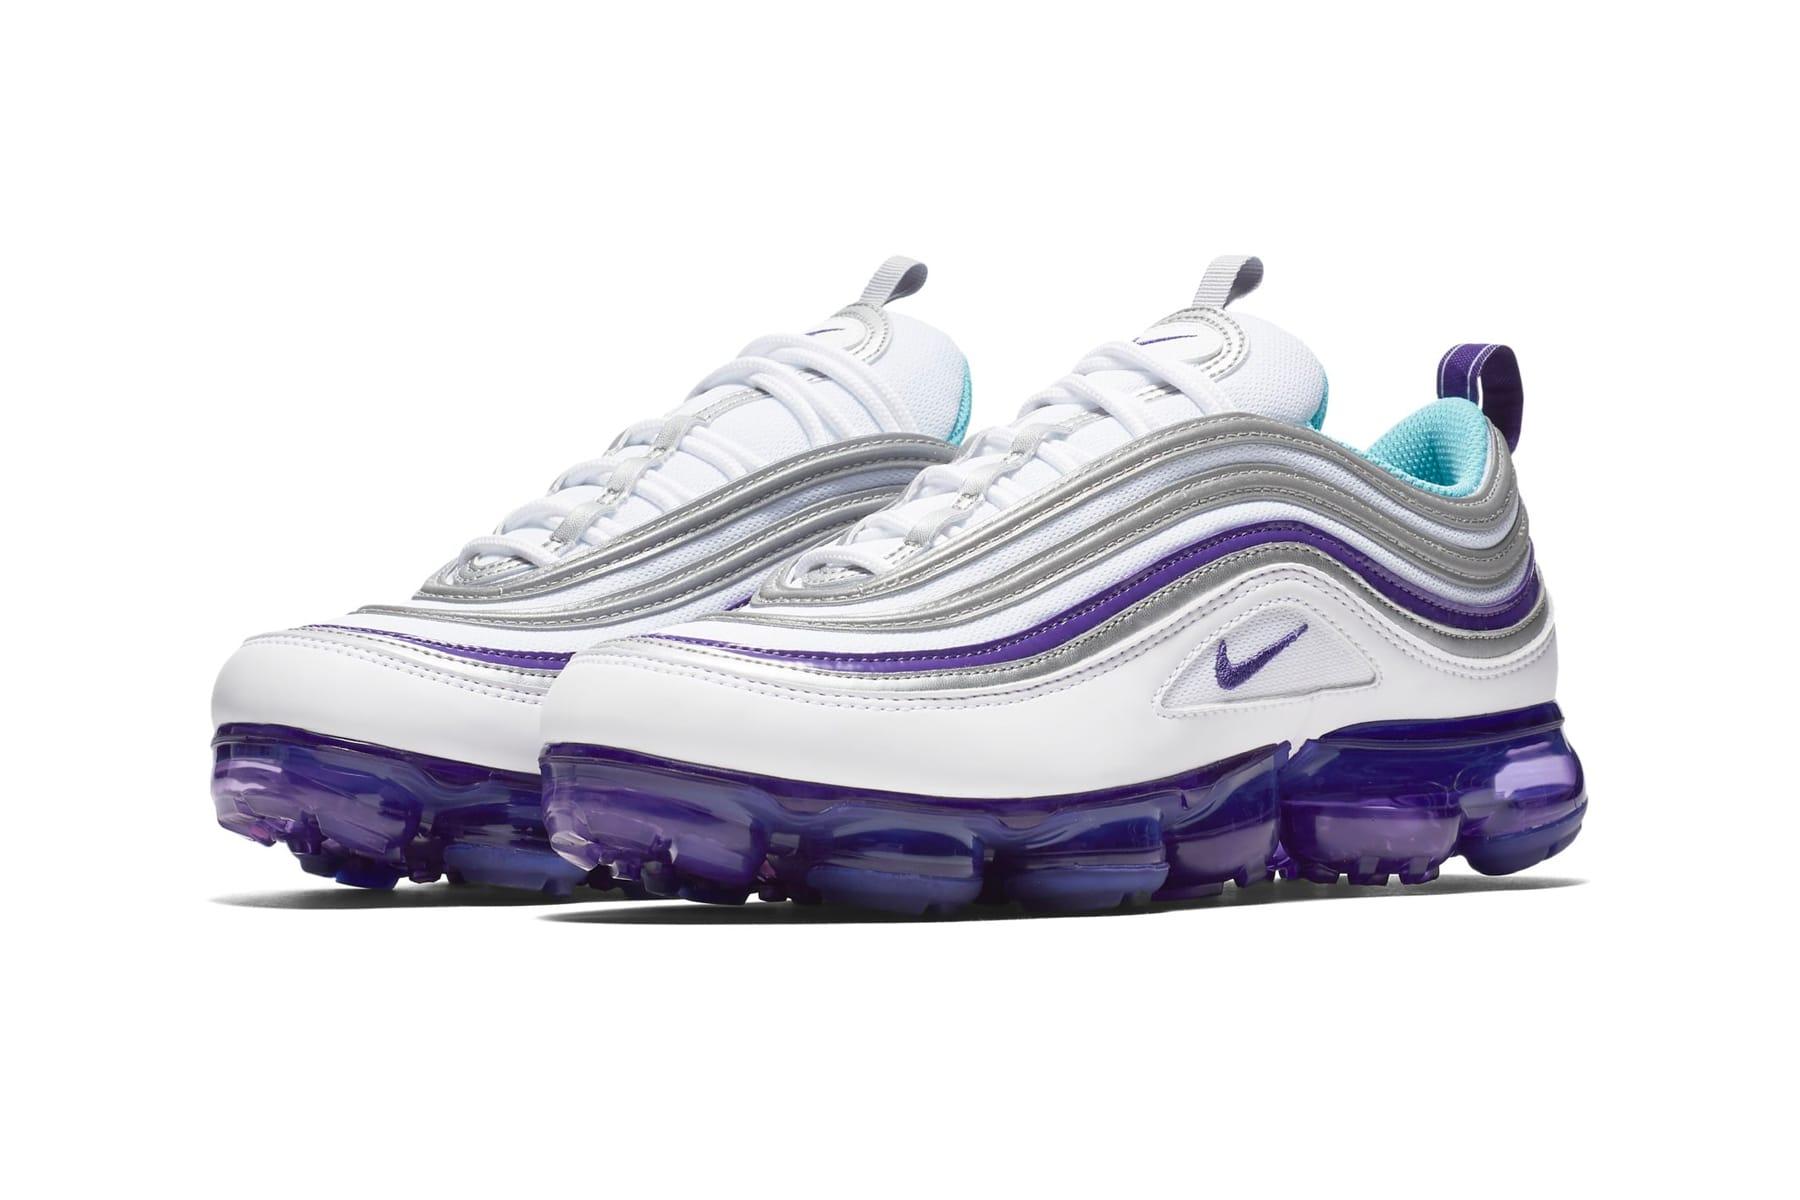 vapormax white purple